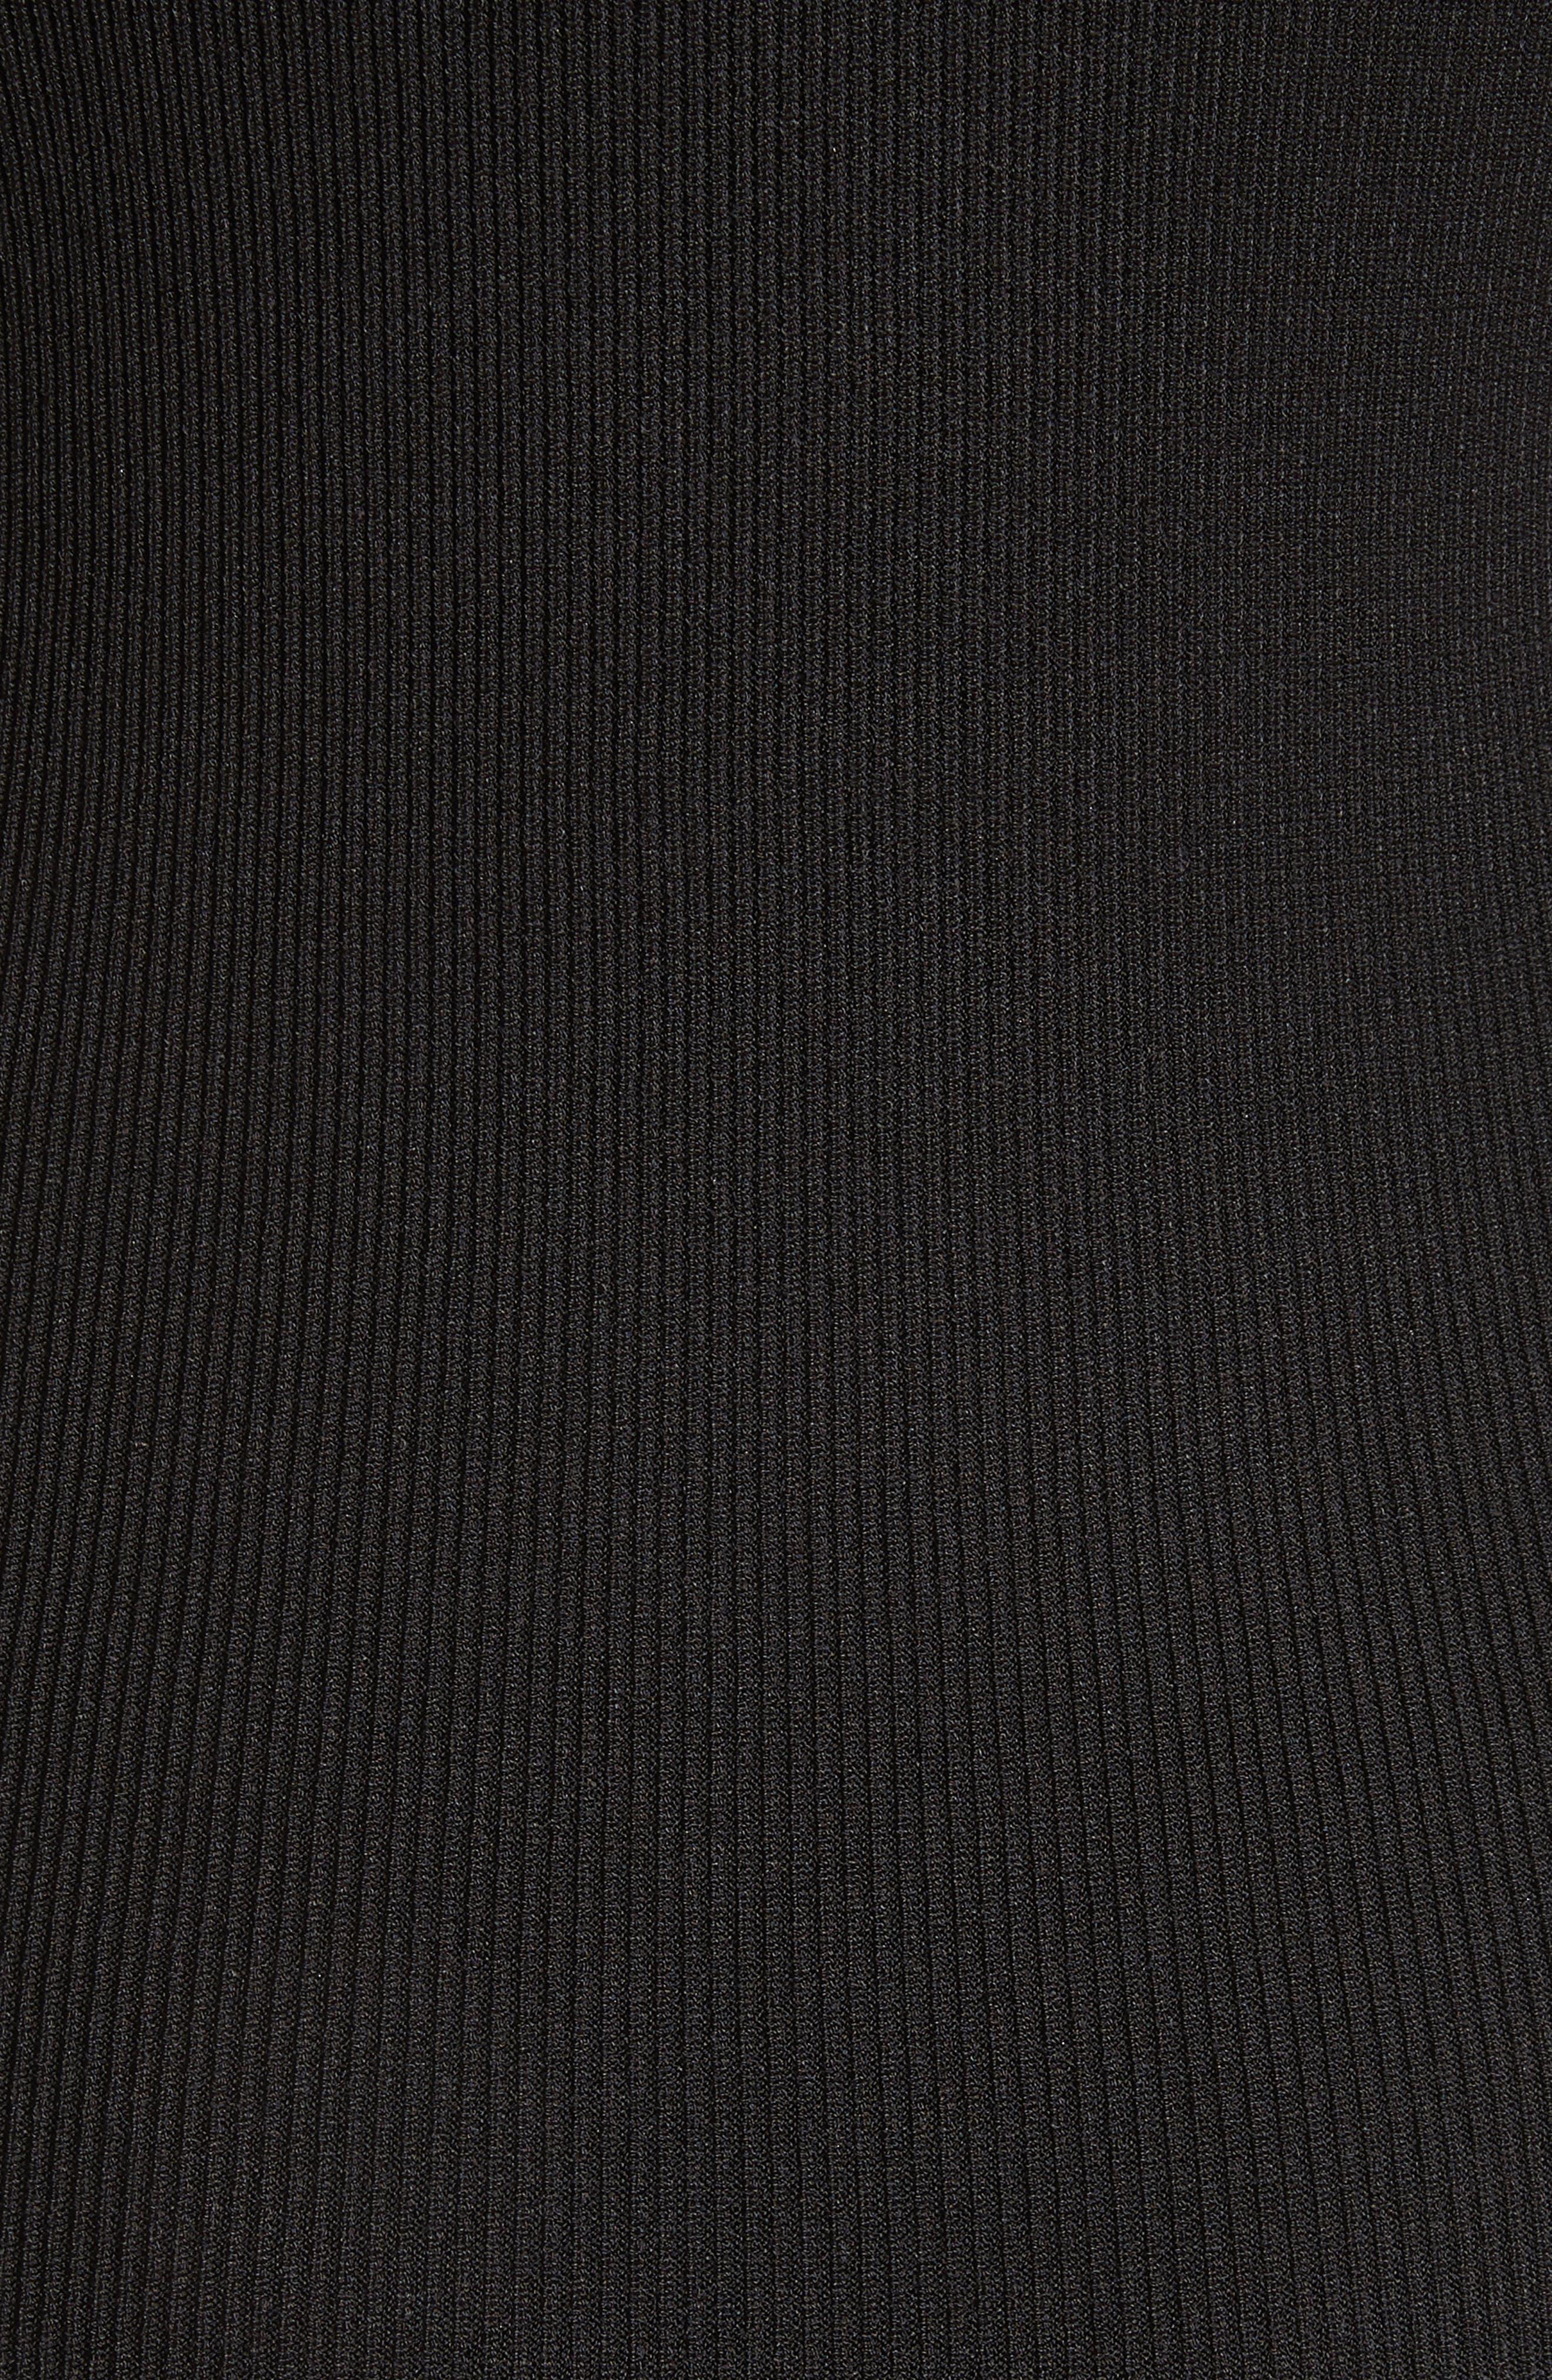 Asymmetrical Knit Dress,                             Alternate thumbnail 6, color,                             Black